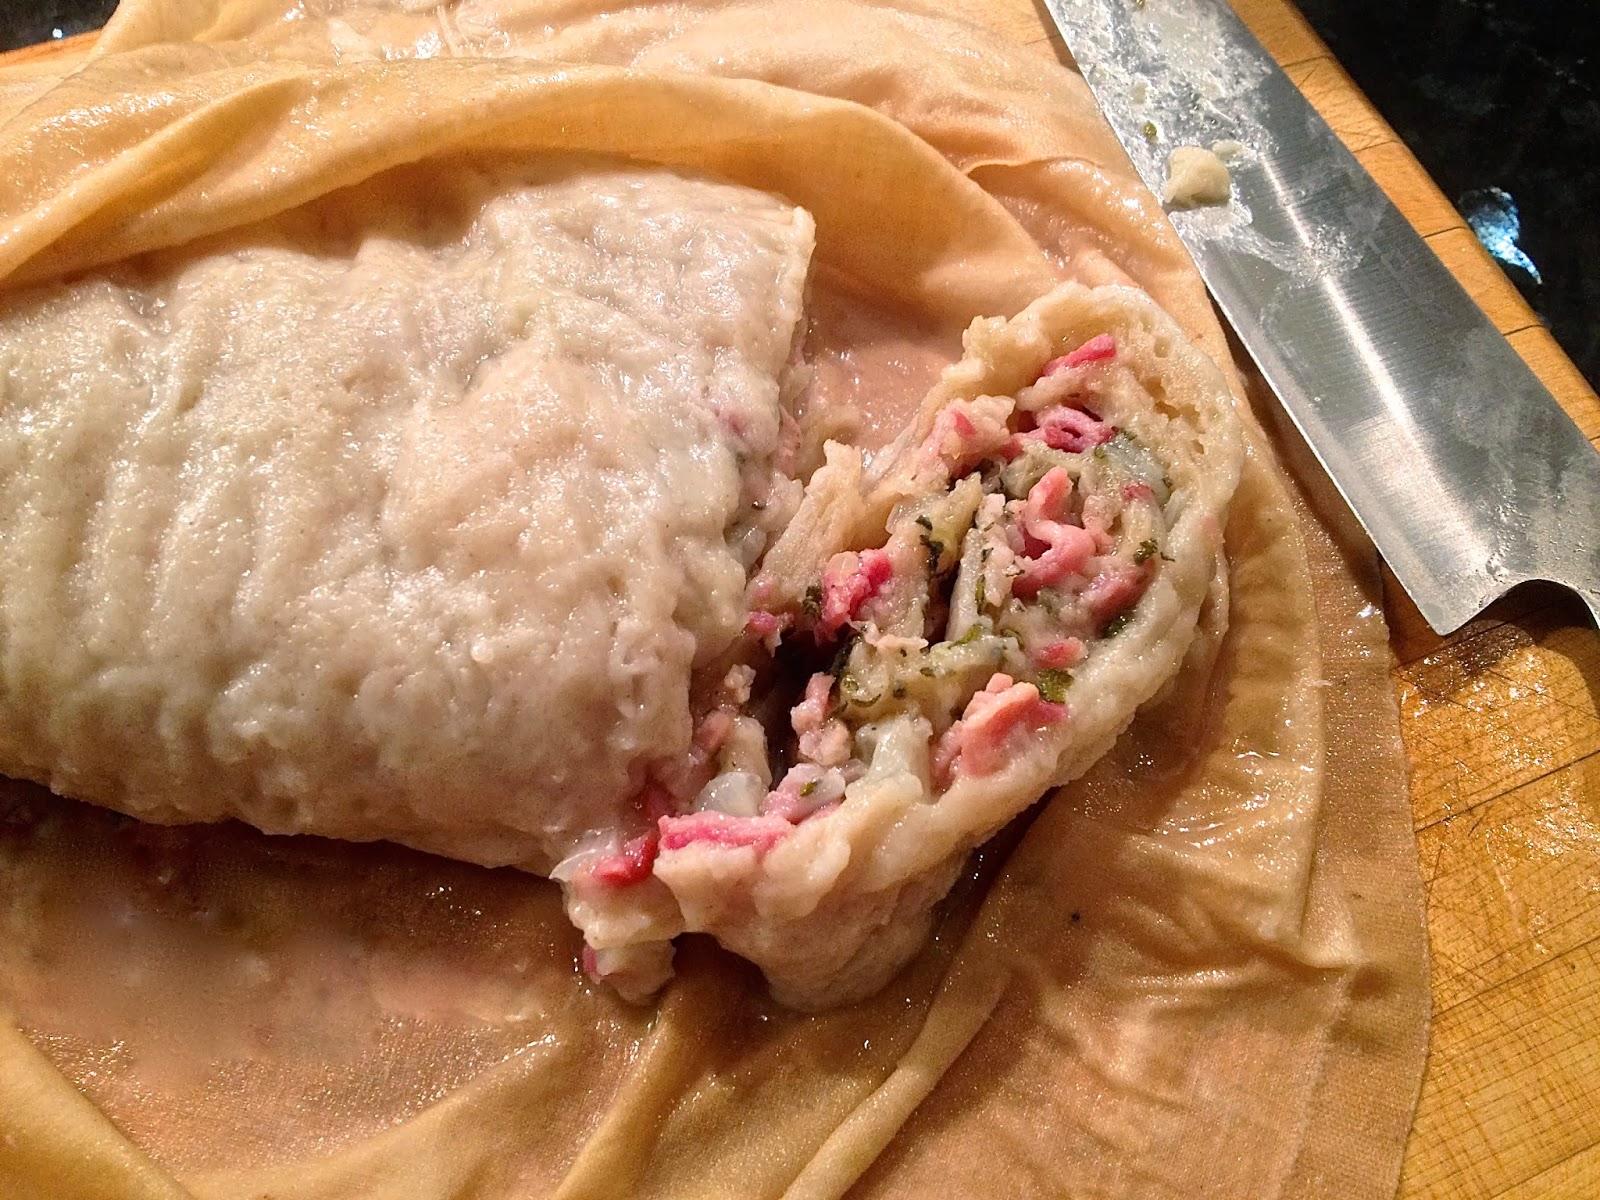 nueva cocina Bacon Sage amp Onion Suet Pudding : IMG0337 from nuevacocina.blogspot.com size 1600 x 1200 jpeg 466kB